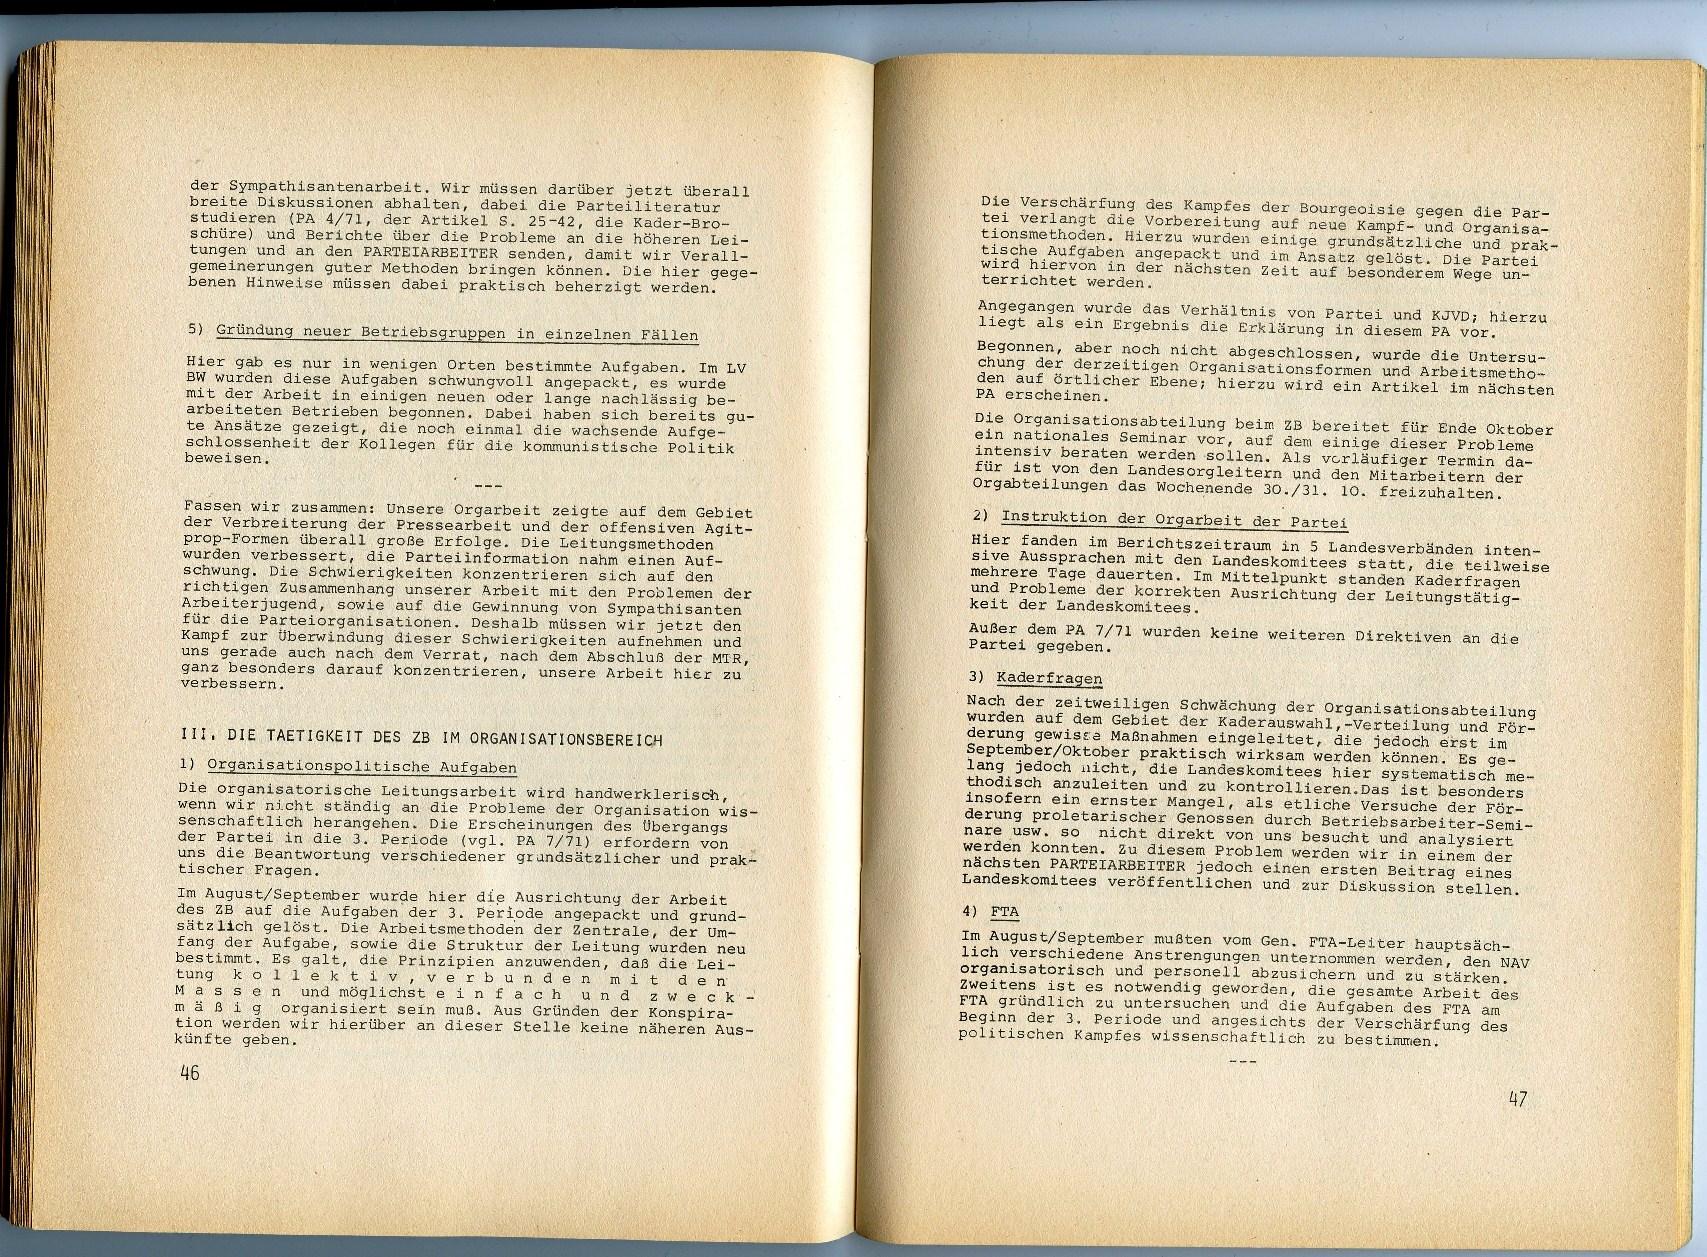 ZB_Parteiarbeiter_1971_08_25